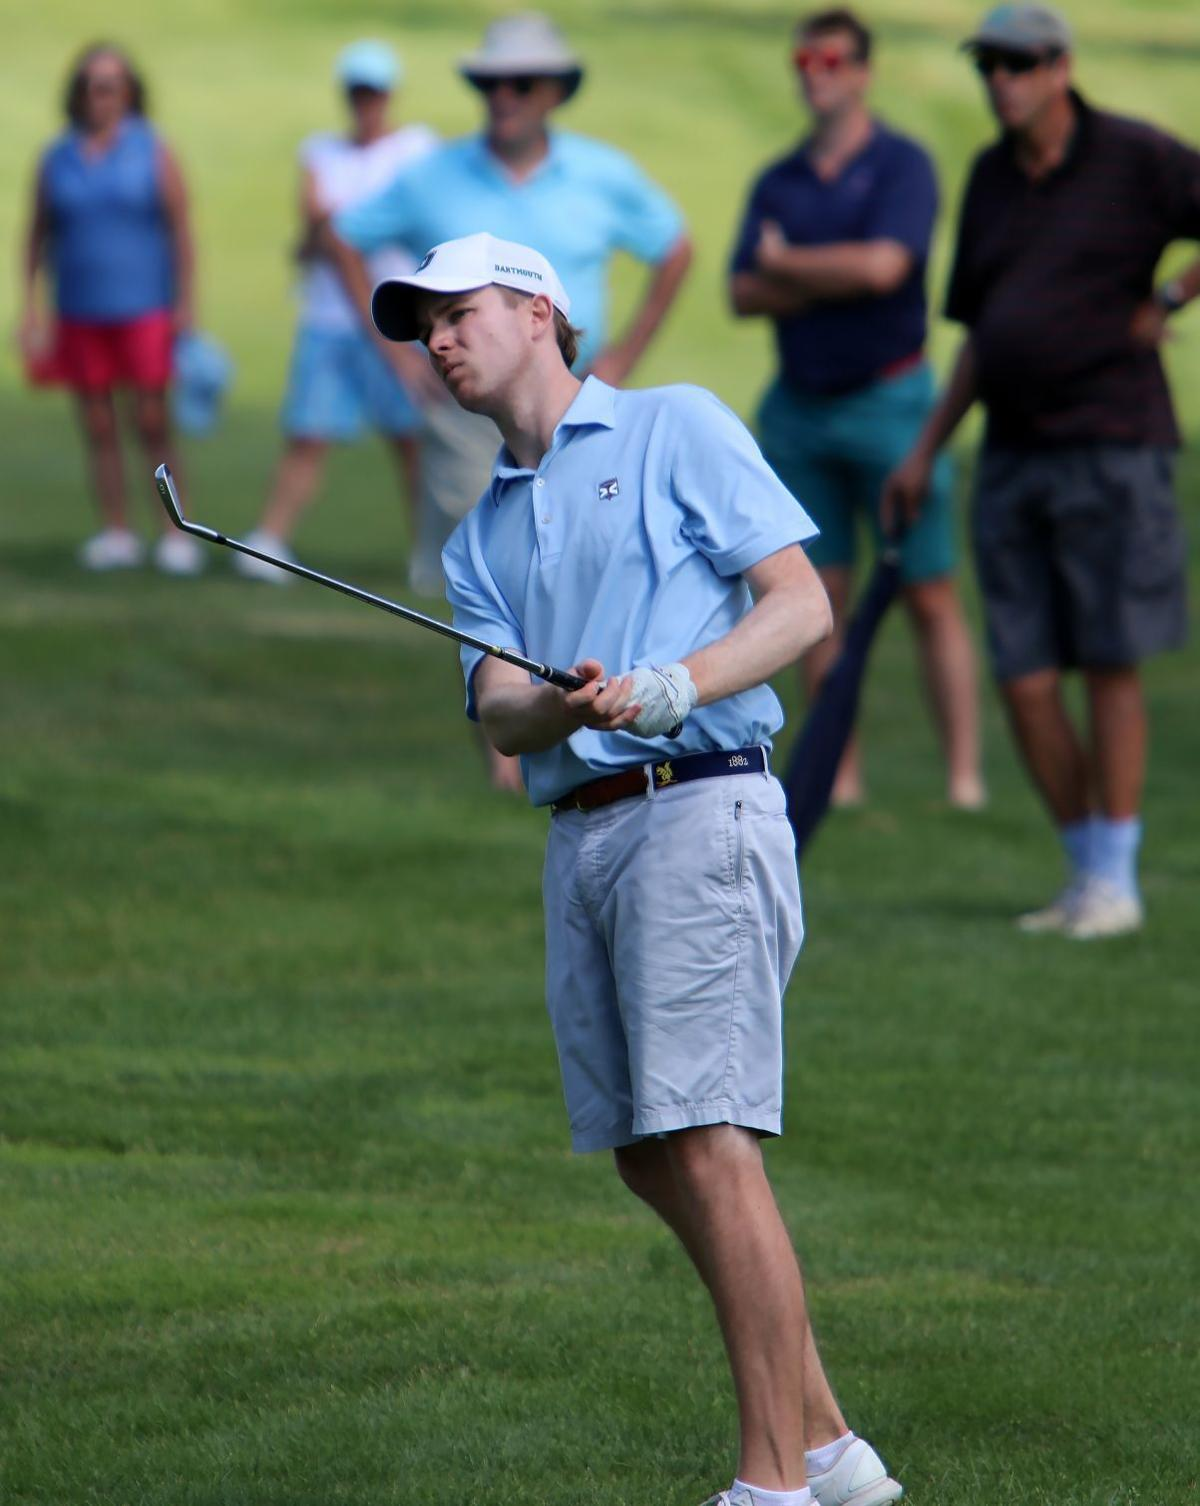 200712-spt-golfamfinal-16 (copy)